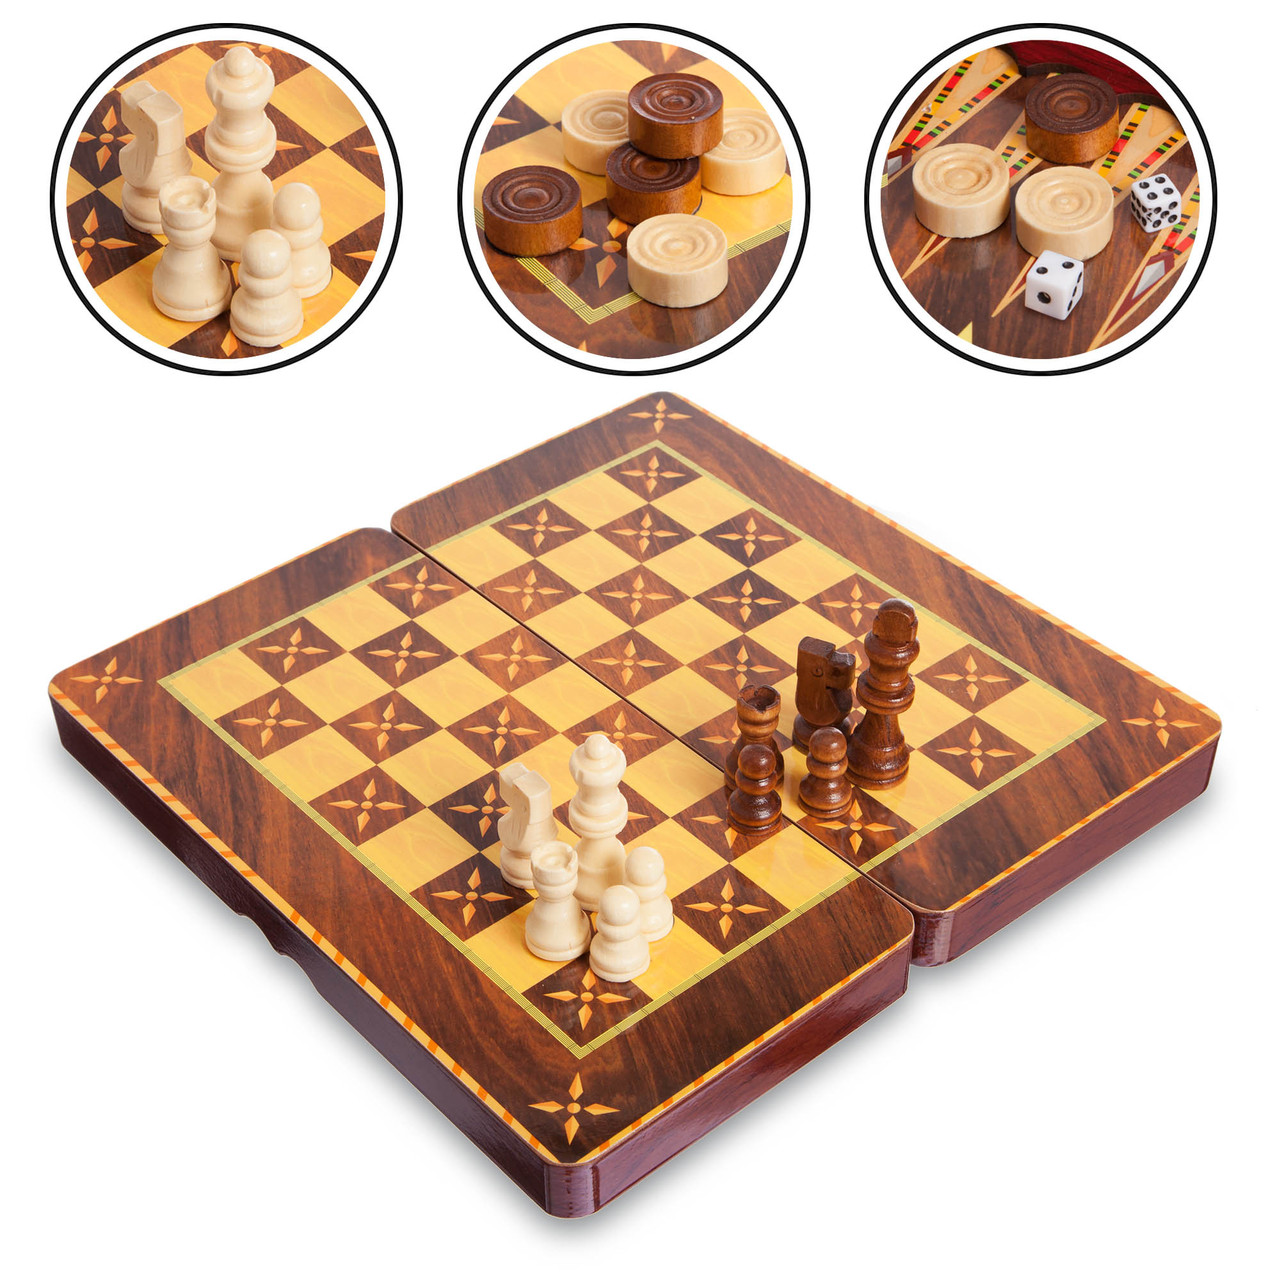 Шахматы, шашки, нарды 3 в 1 (29 x 29см) 5566C